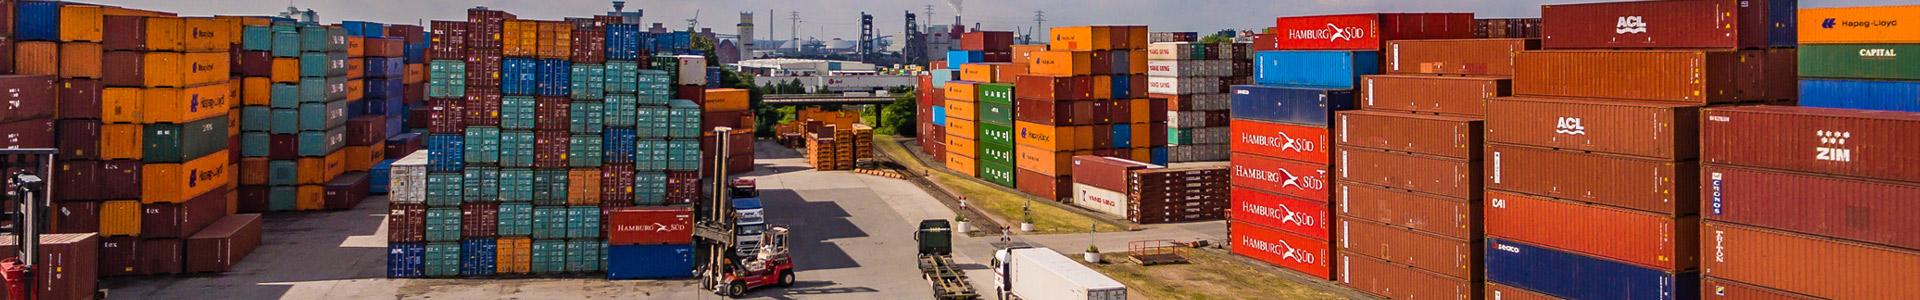 containerlagerung6